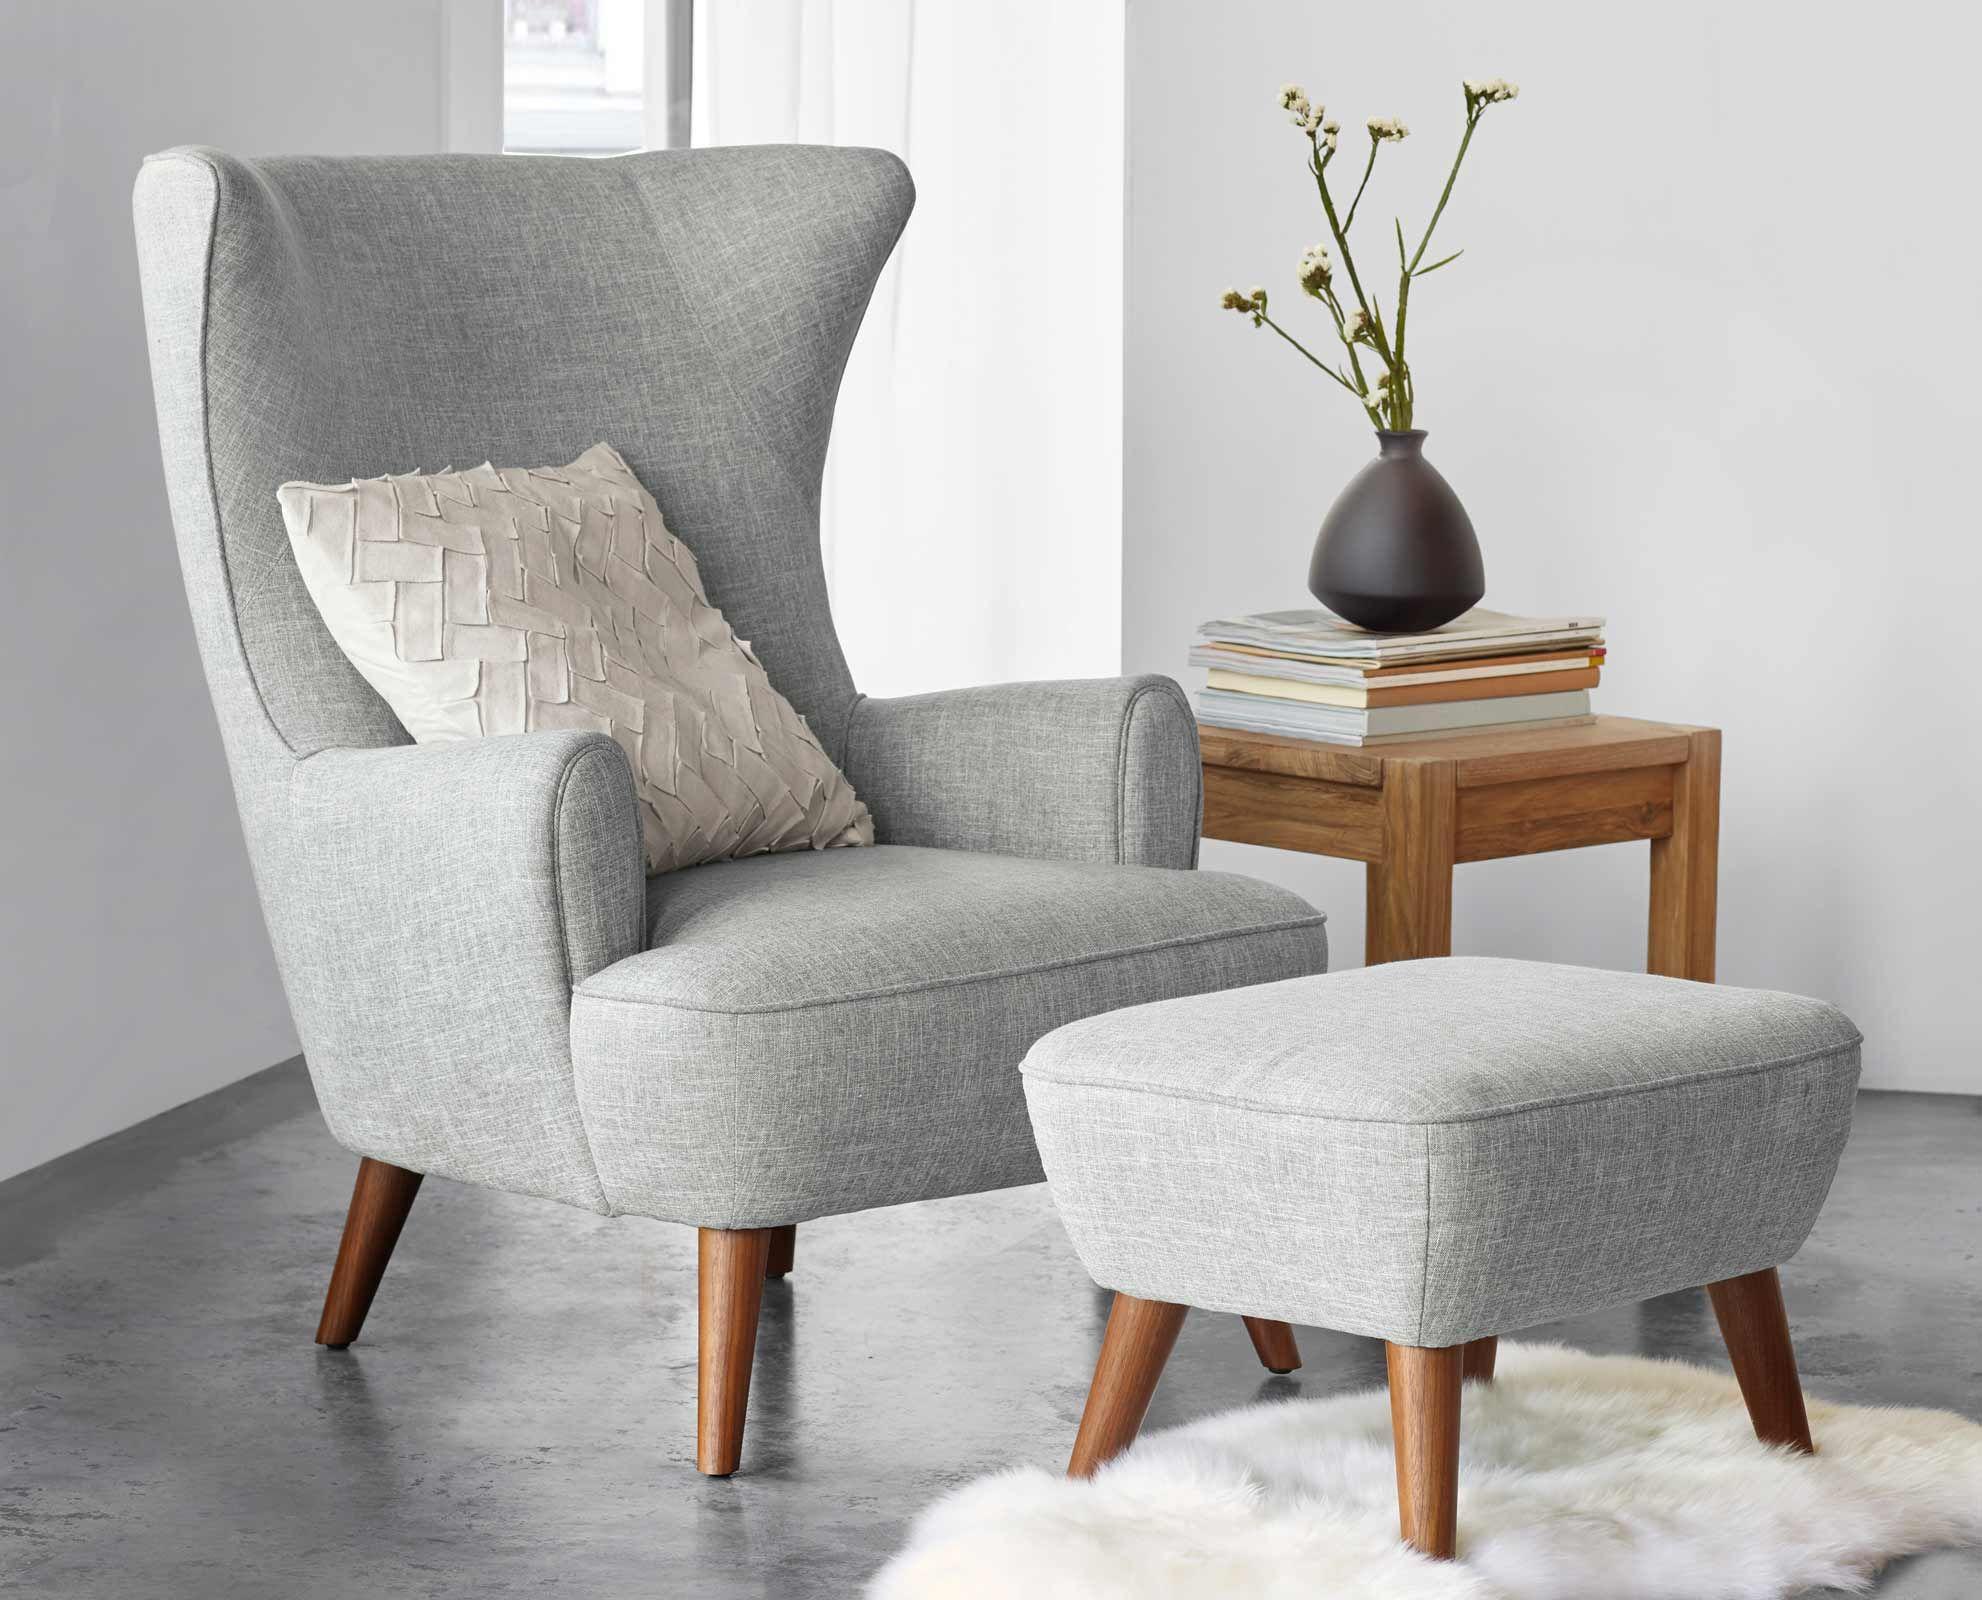 Comfort Of Home Furniture Exterior Interior 28 gorgeous modern scandinavian interior design ideas | apartment